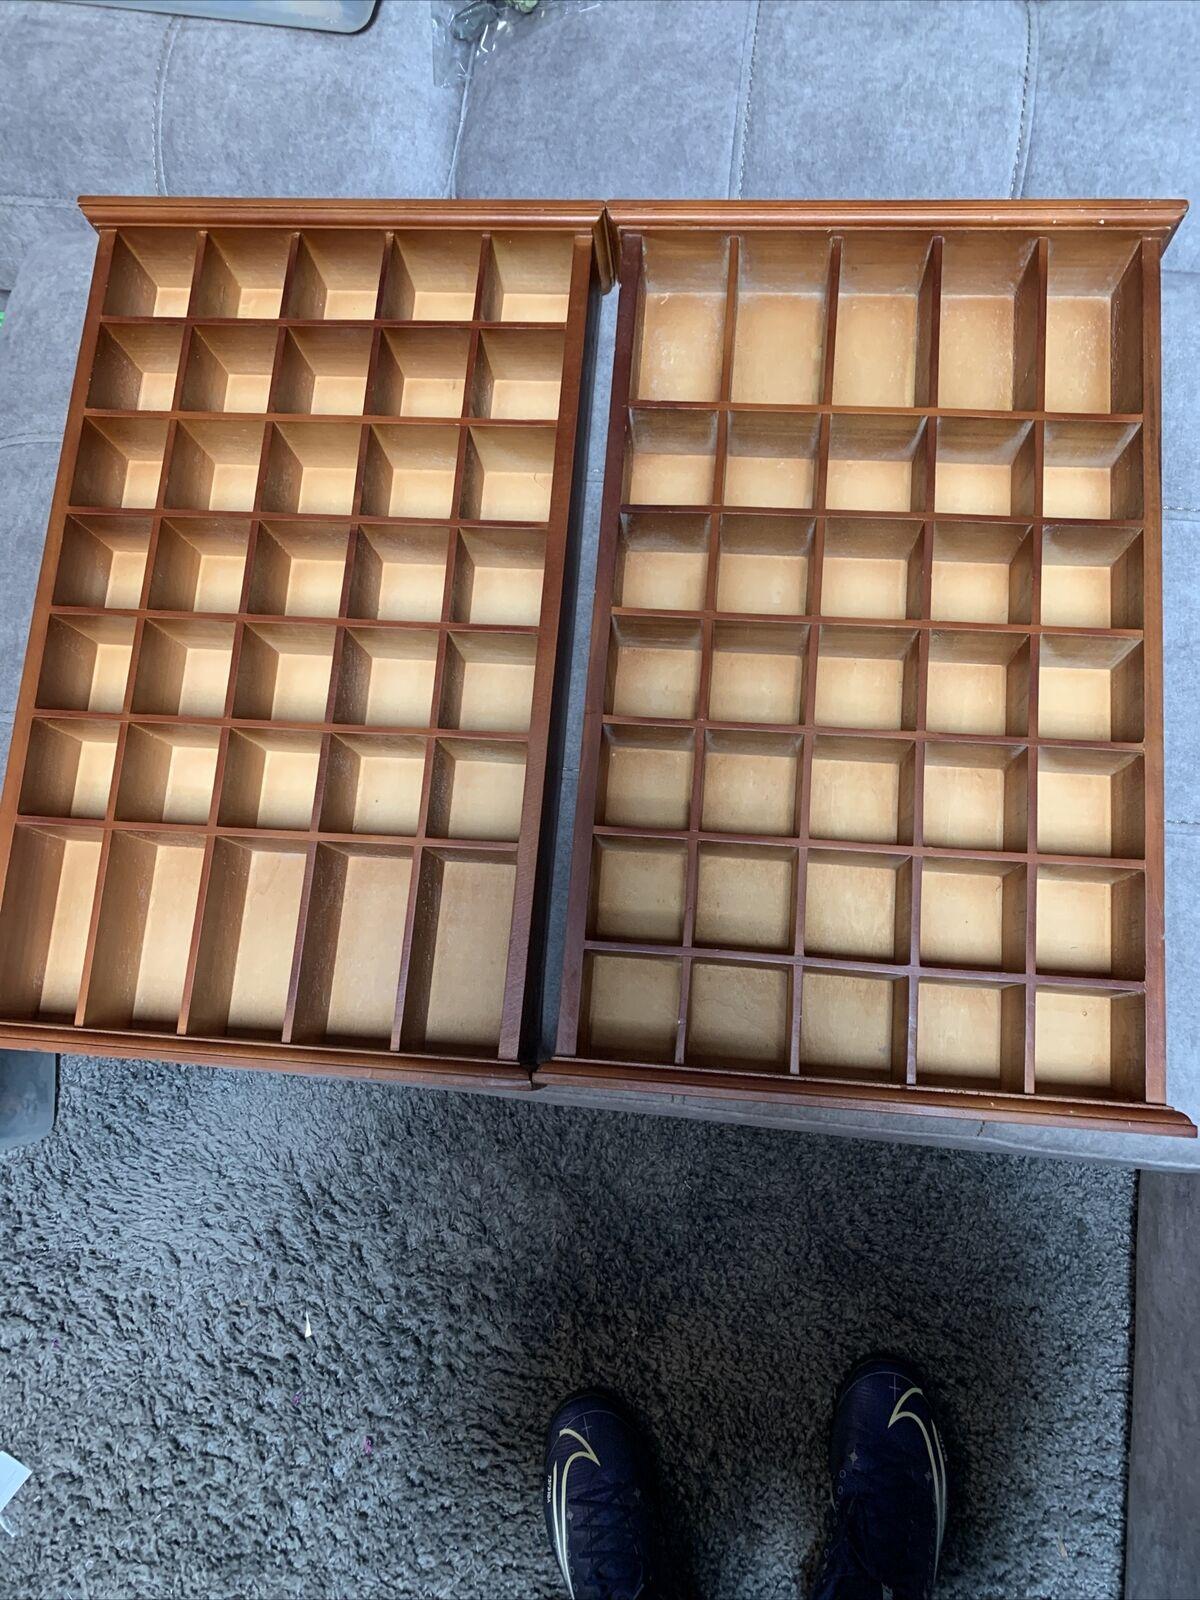 35 shot glass shooter display case holder cabinet wall rack wood set of 2